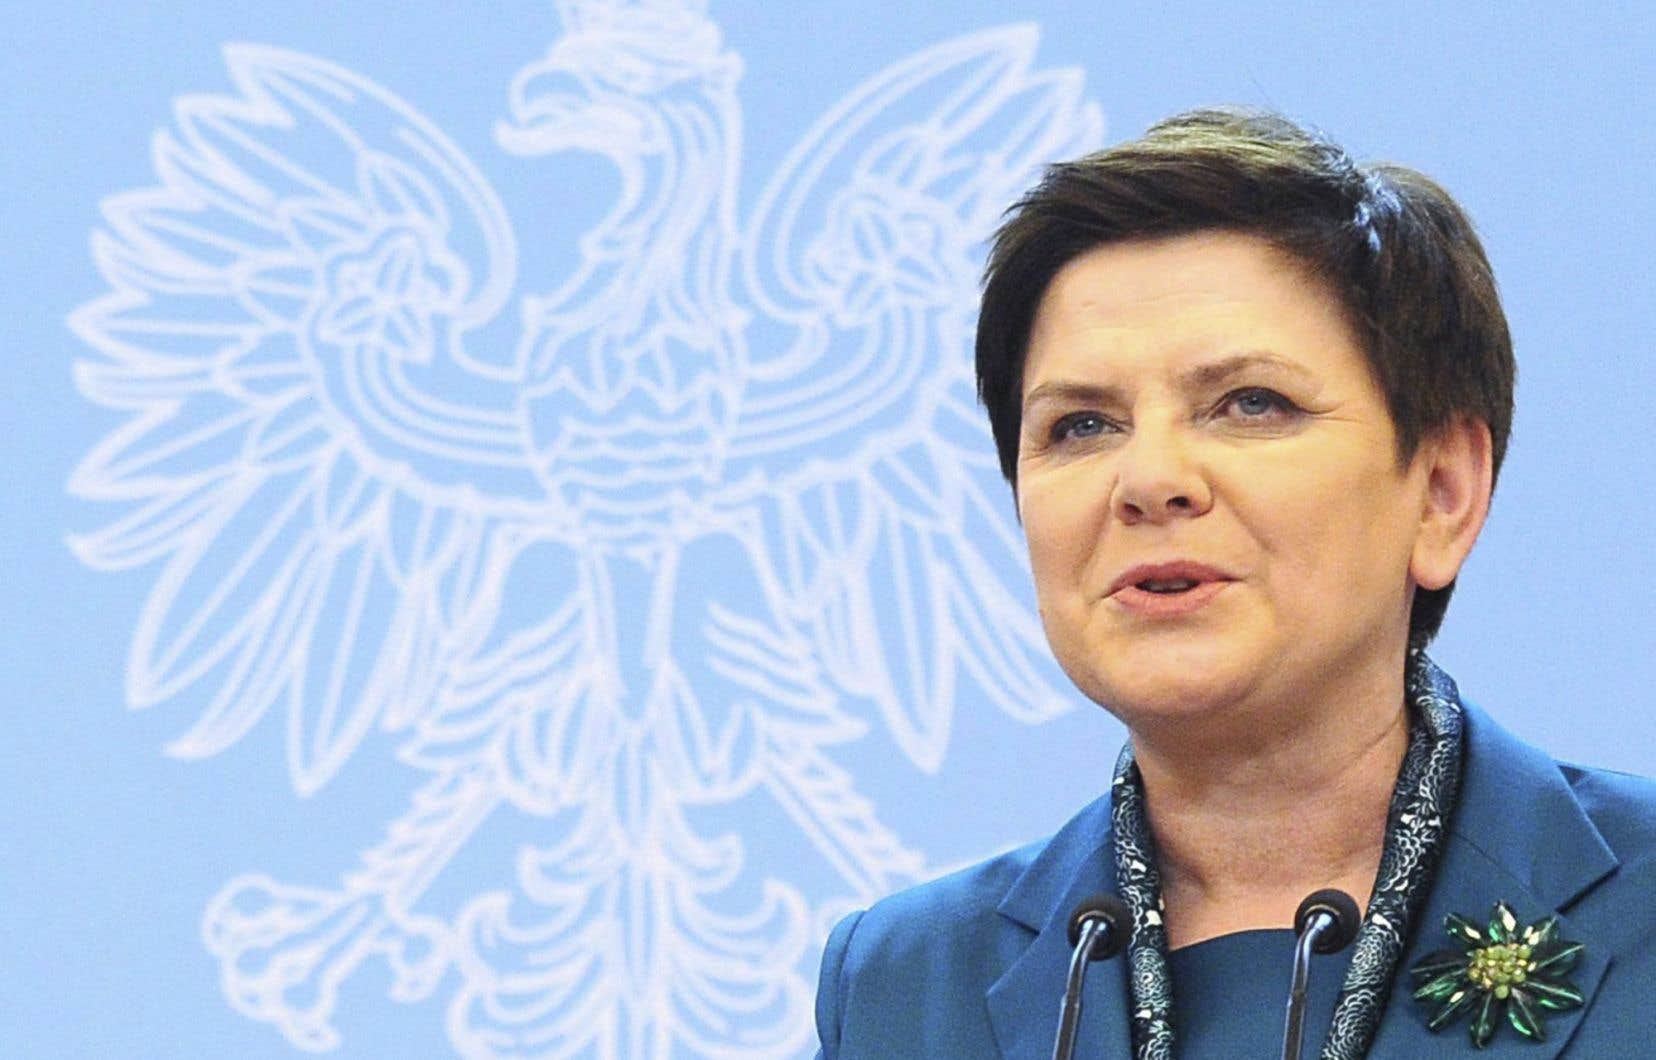 La première ministre de la Pologne, Beata Szydlo